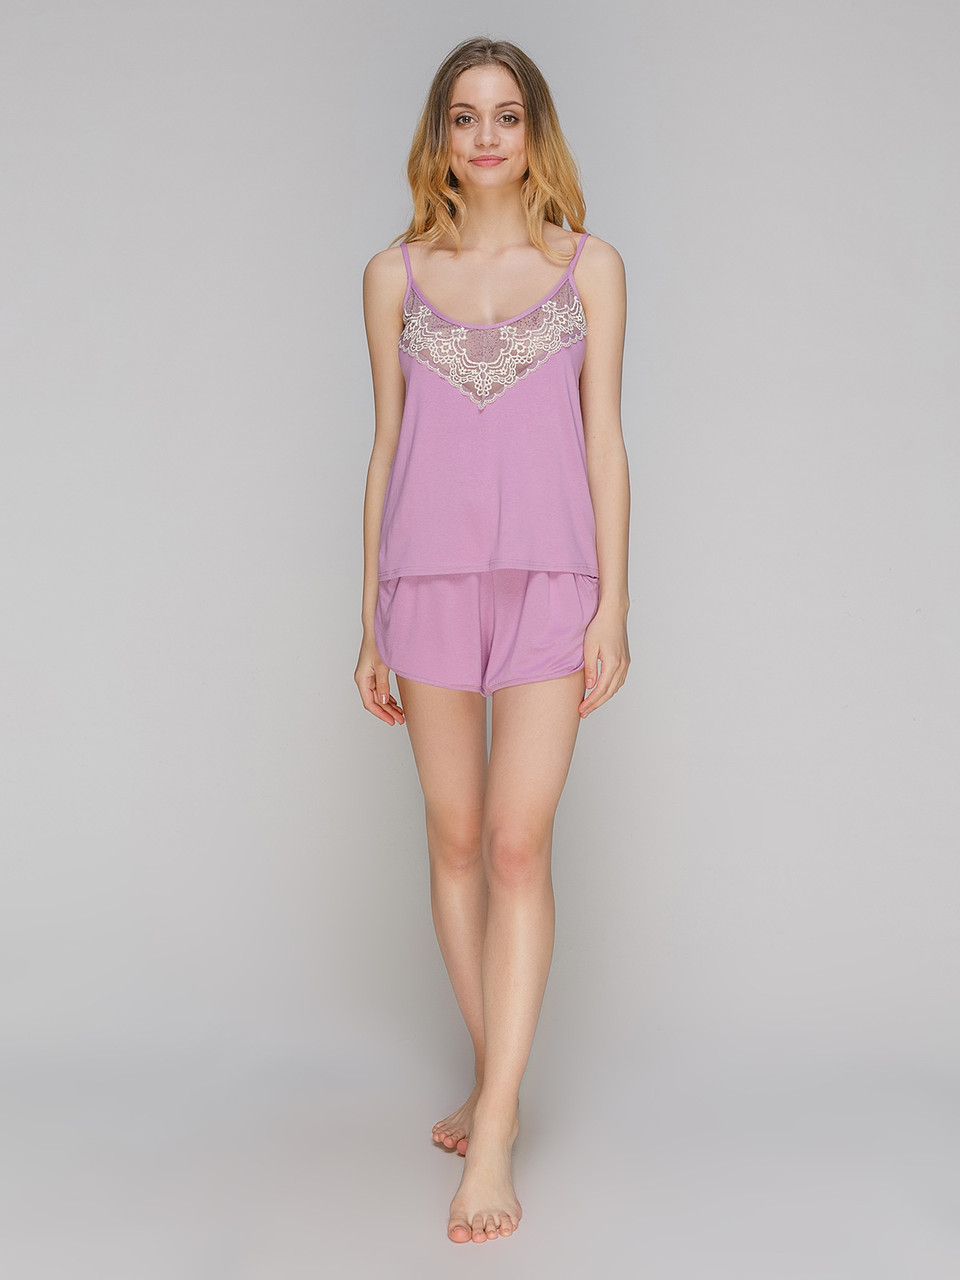 Пижама с шортами вискоза Serenade фрез c кружевом